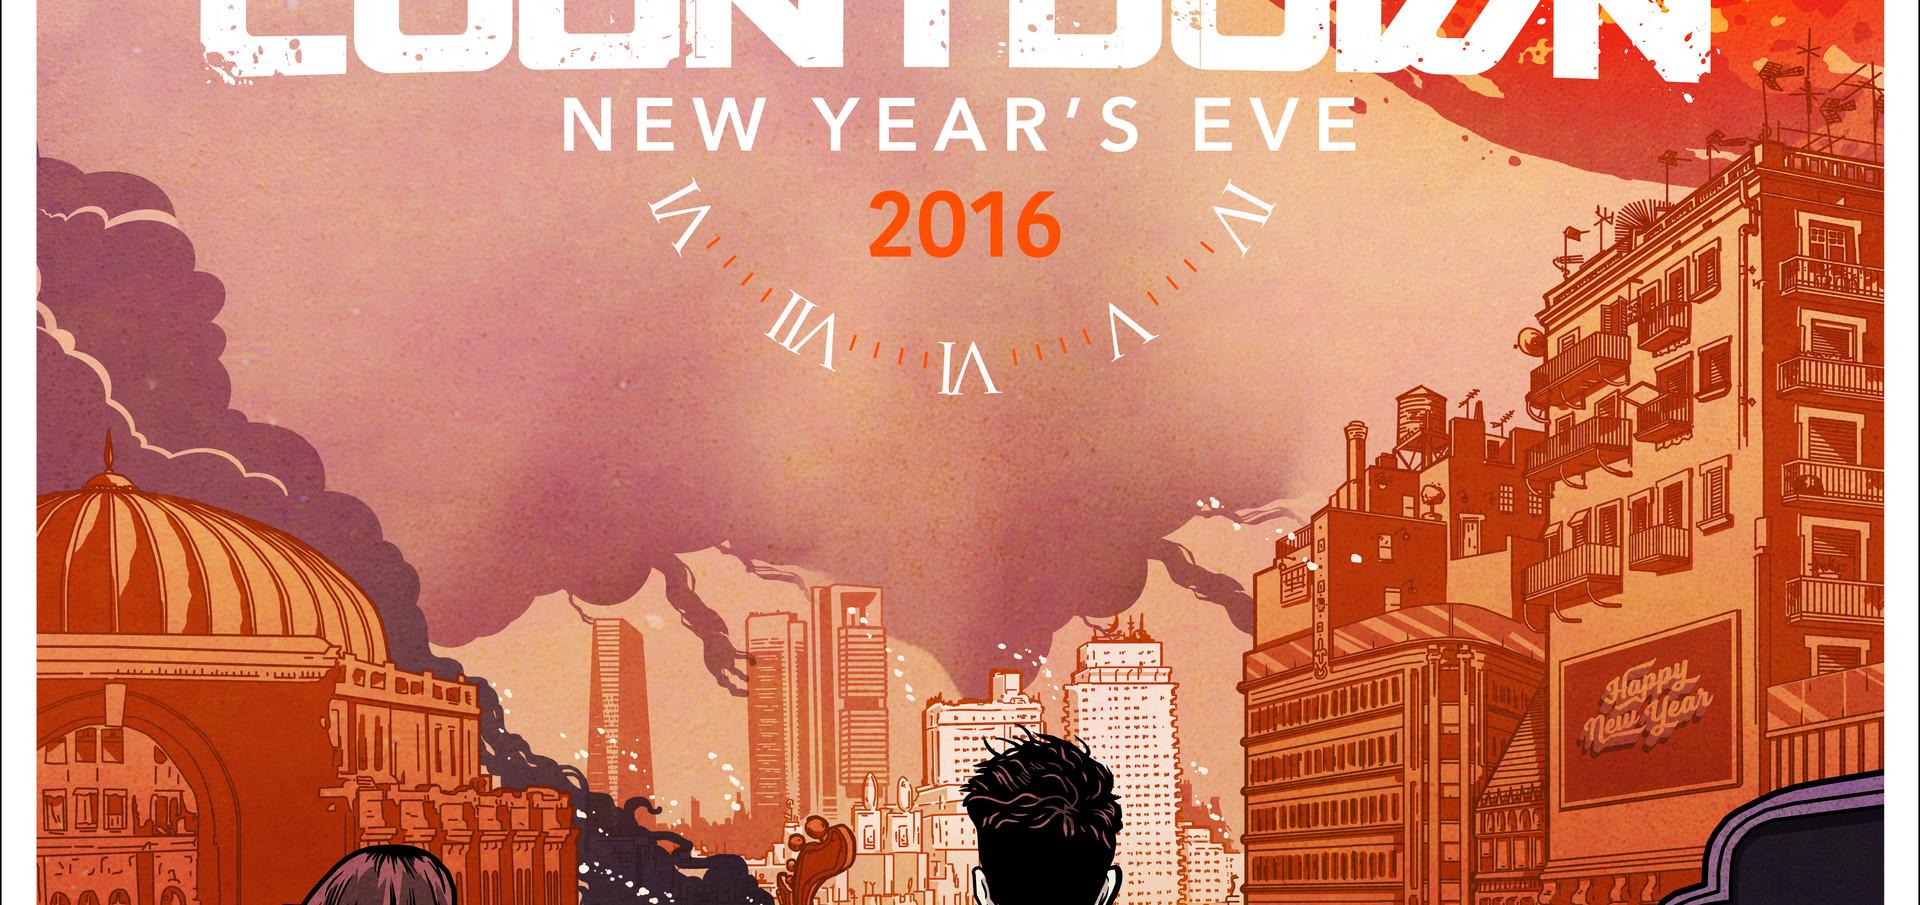 COUNTDOWN 2016 LE PROMO POSTER